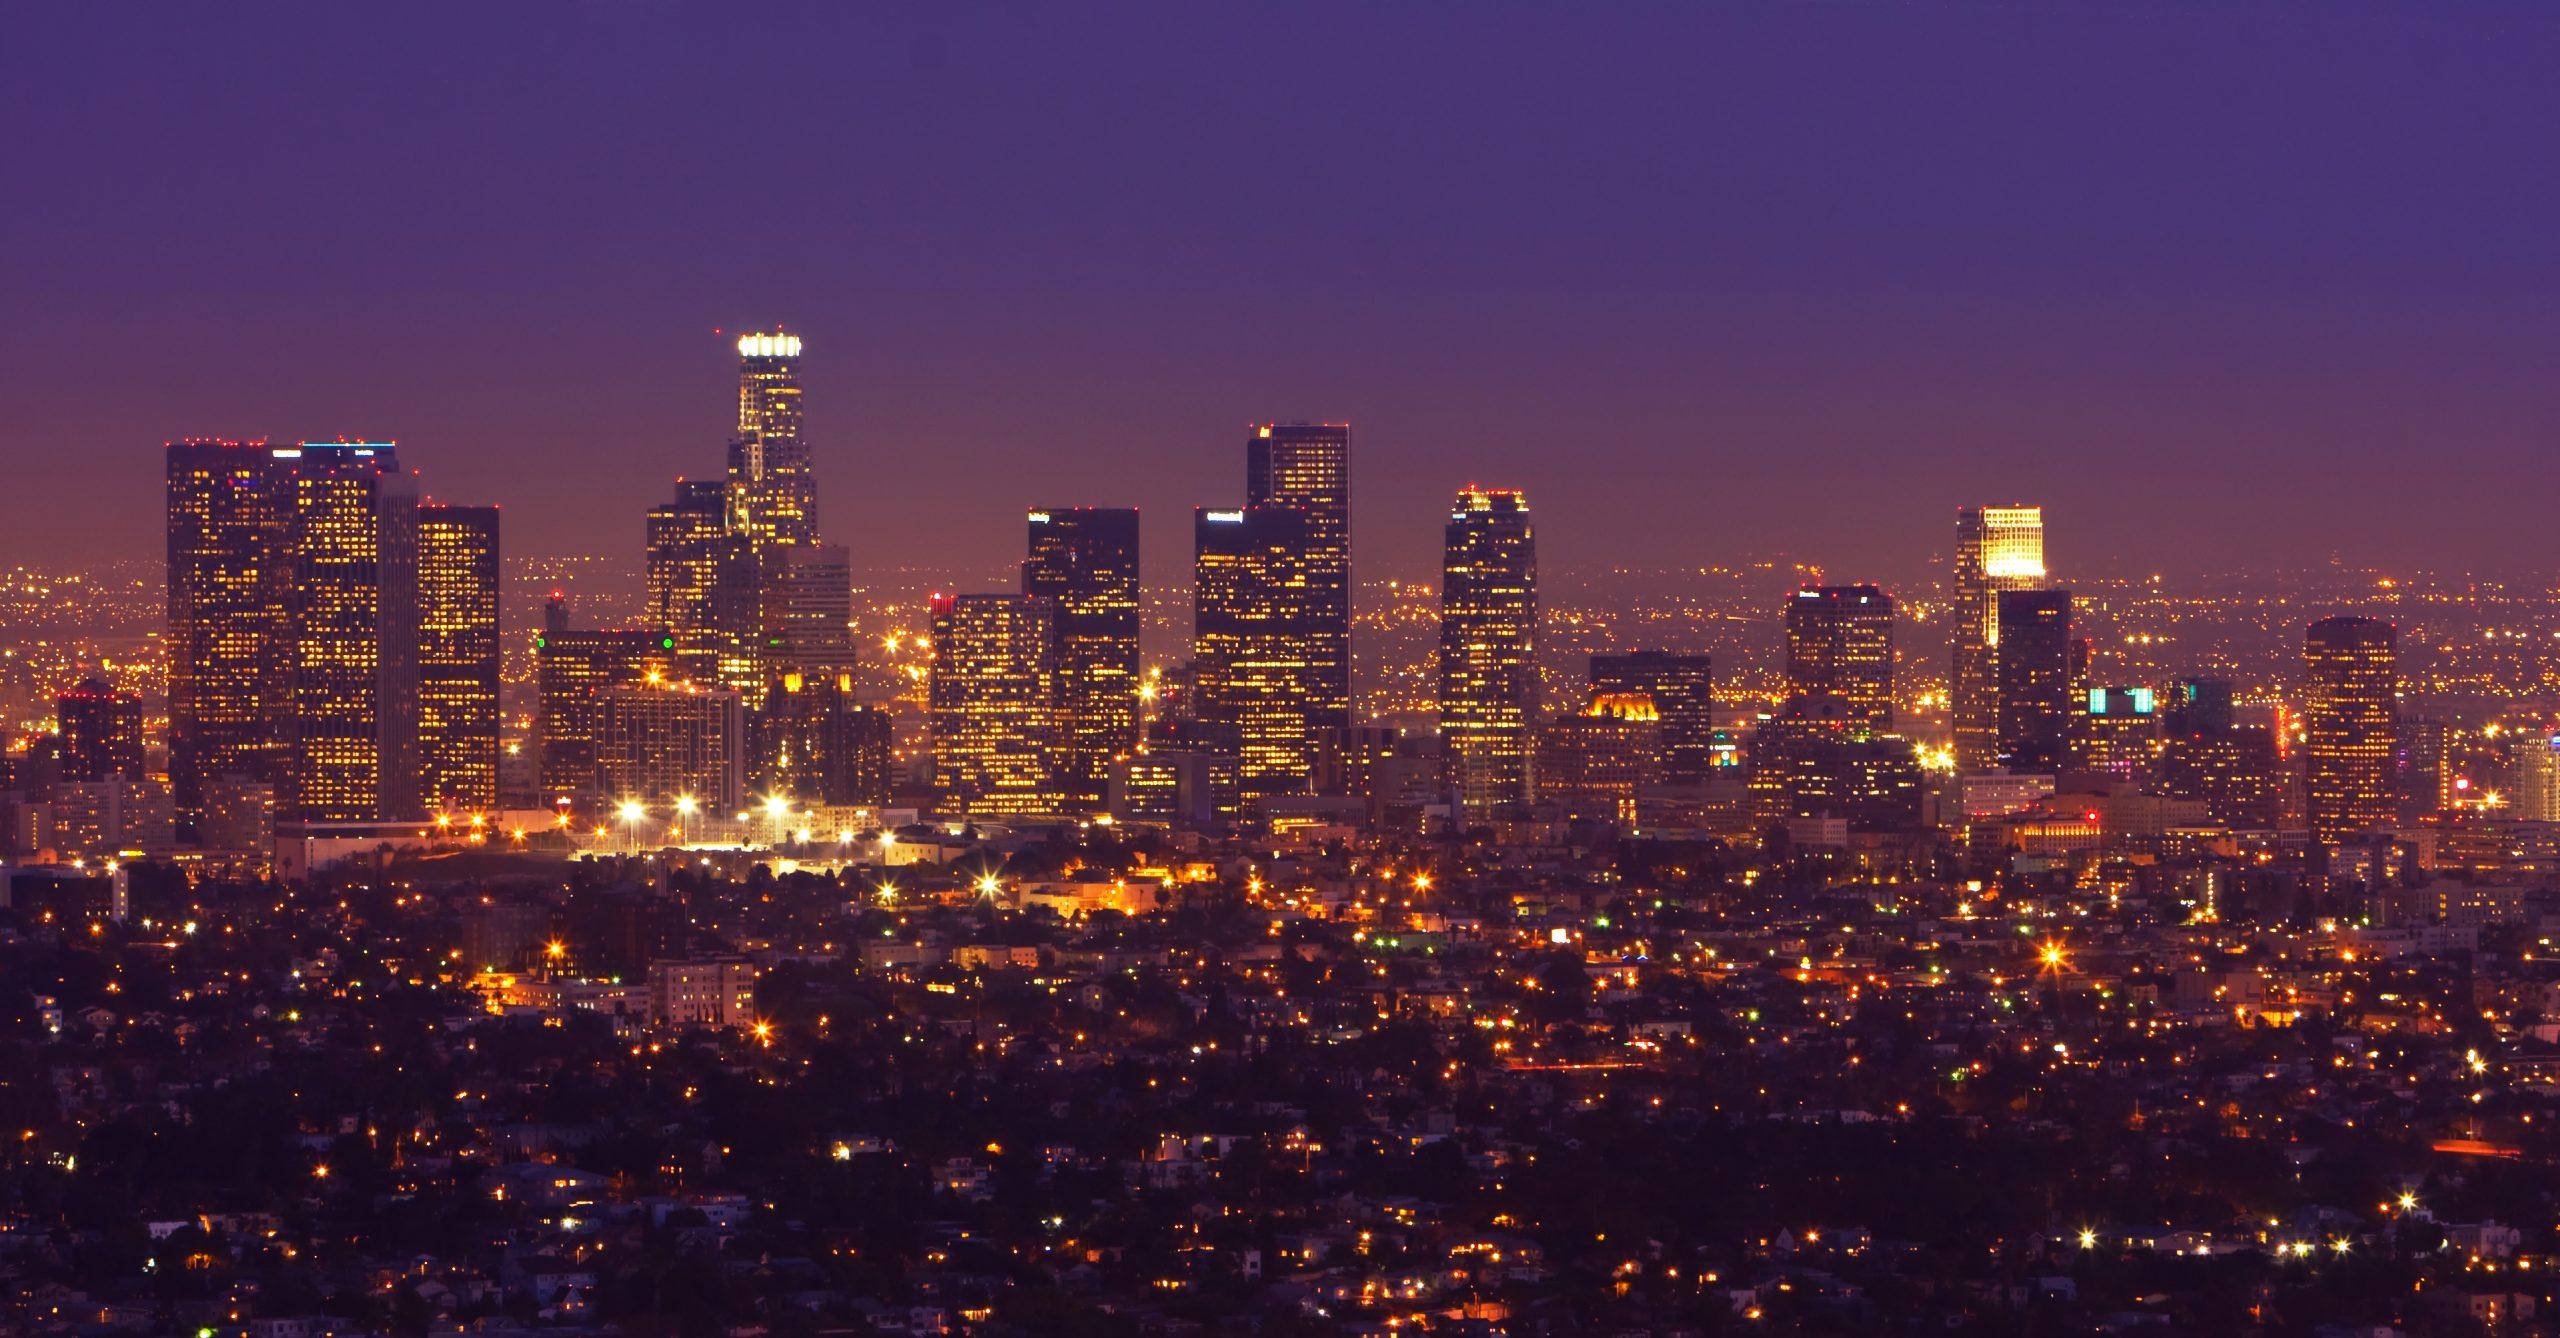 Los Angeles, Urban City at Sunset